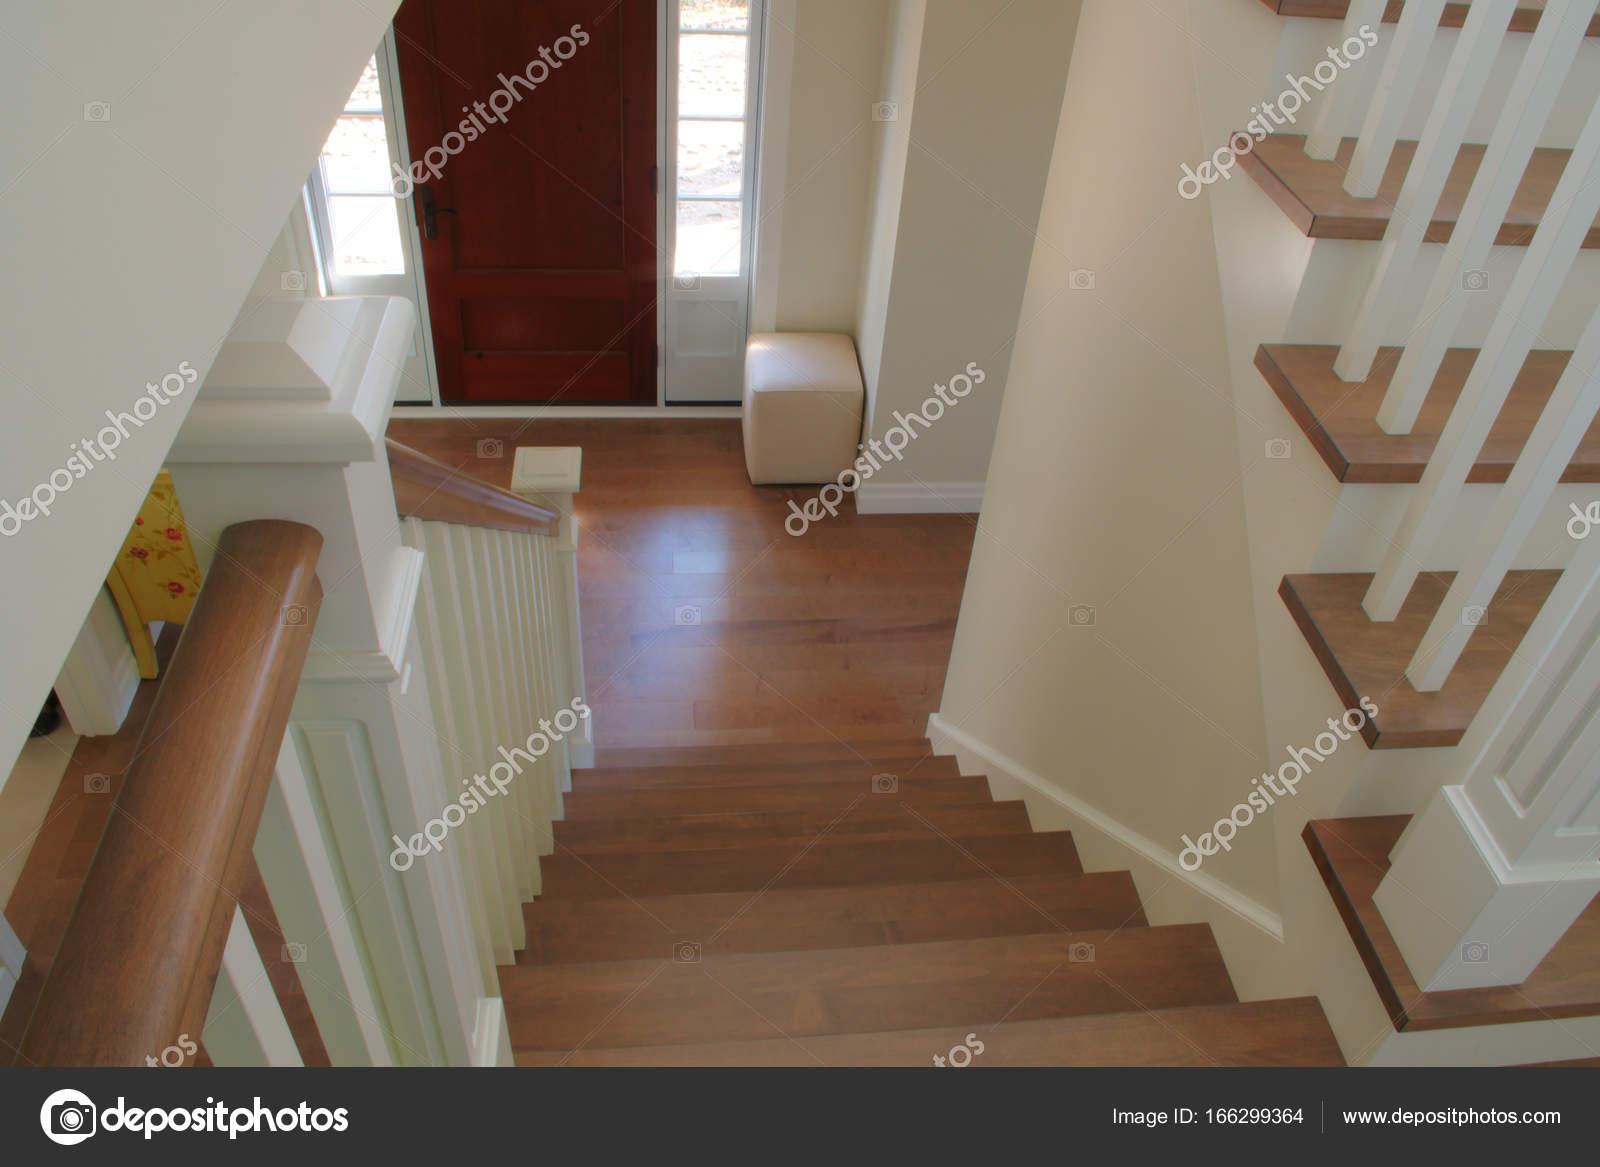 Interieur trap wit hout residentie trap u stockfoto